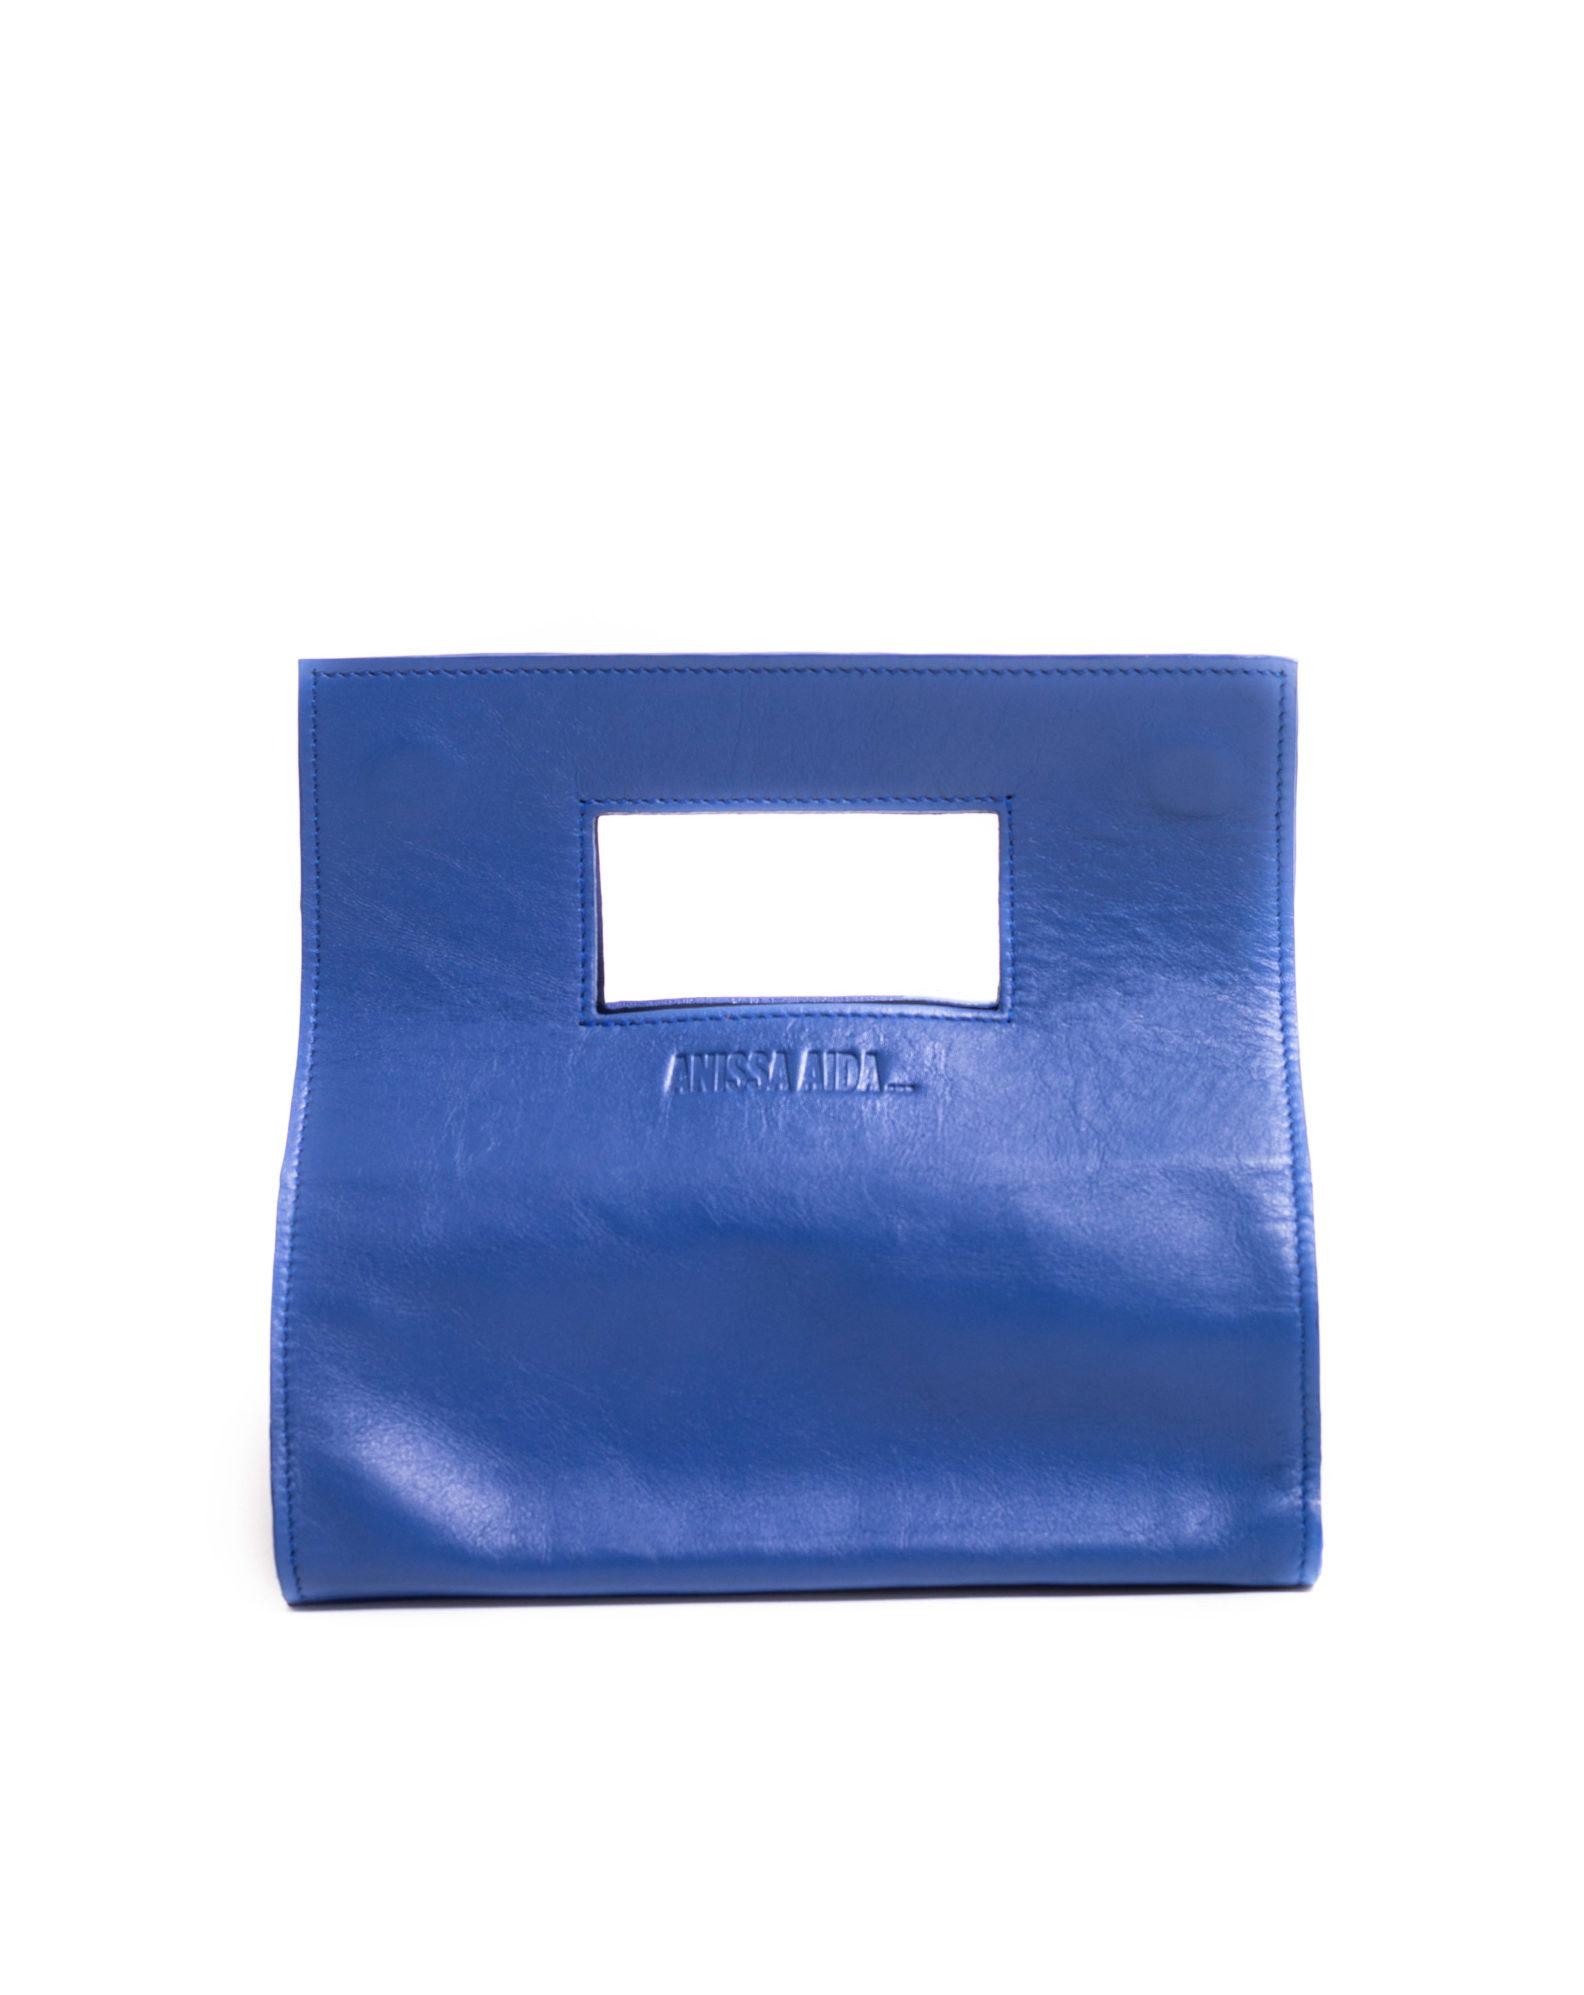 cabas-carre-en-cuir-anissa-aida-affaires-etrangeres-leather-squared-bag-mode-ethnique-chic-ethnic-fashion